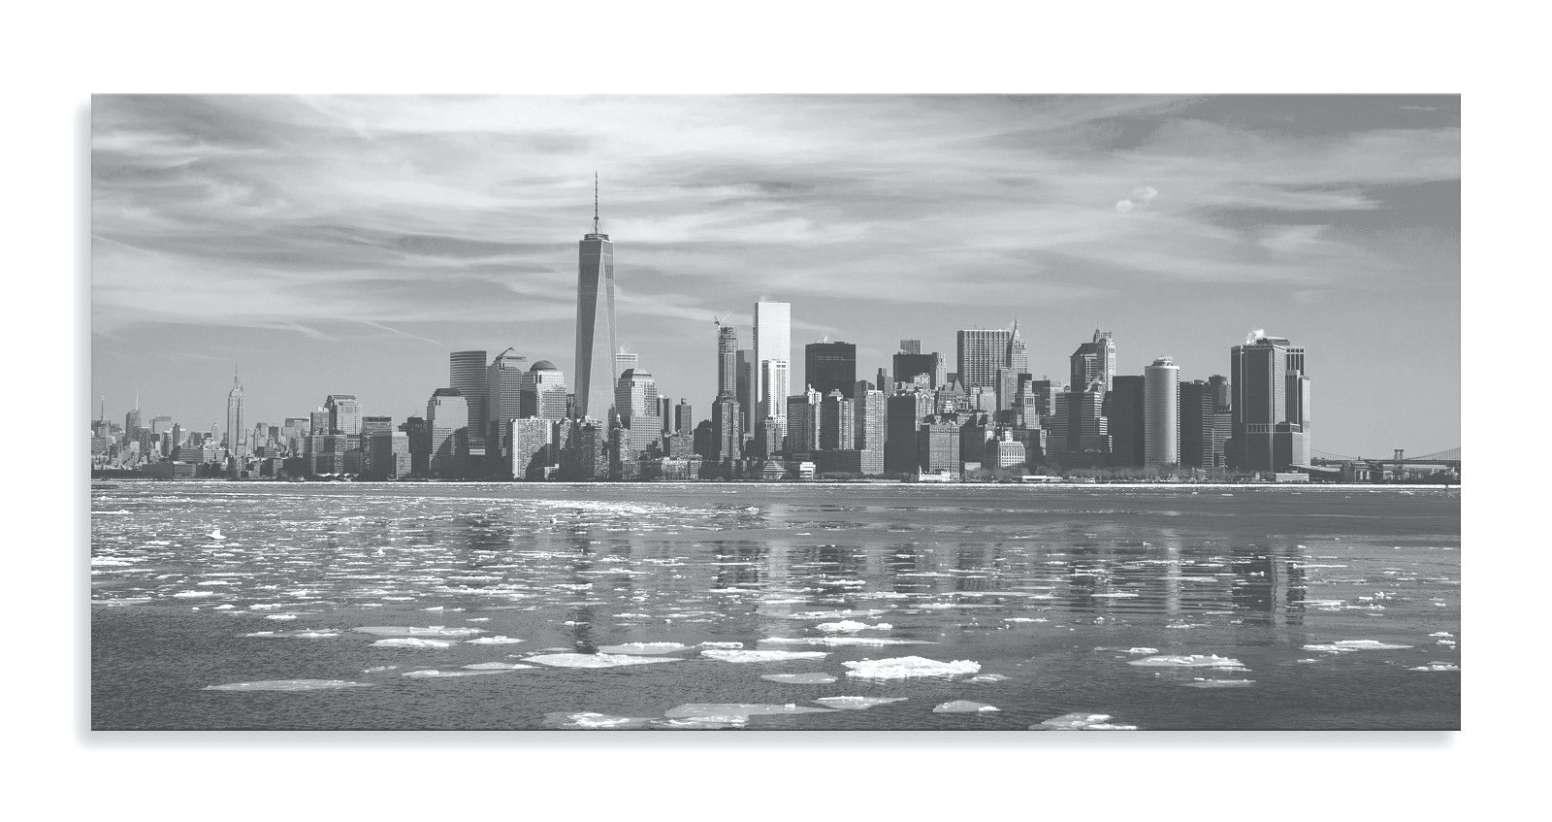 45 Ideas Of New York City Wall Art, Nyc Wall Art - Swinki Morskie throughout New York City Wall Art (Image 4 of 20)